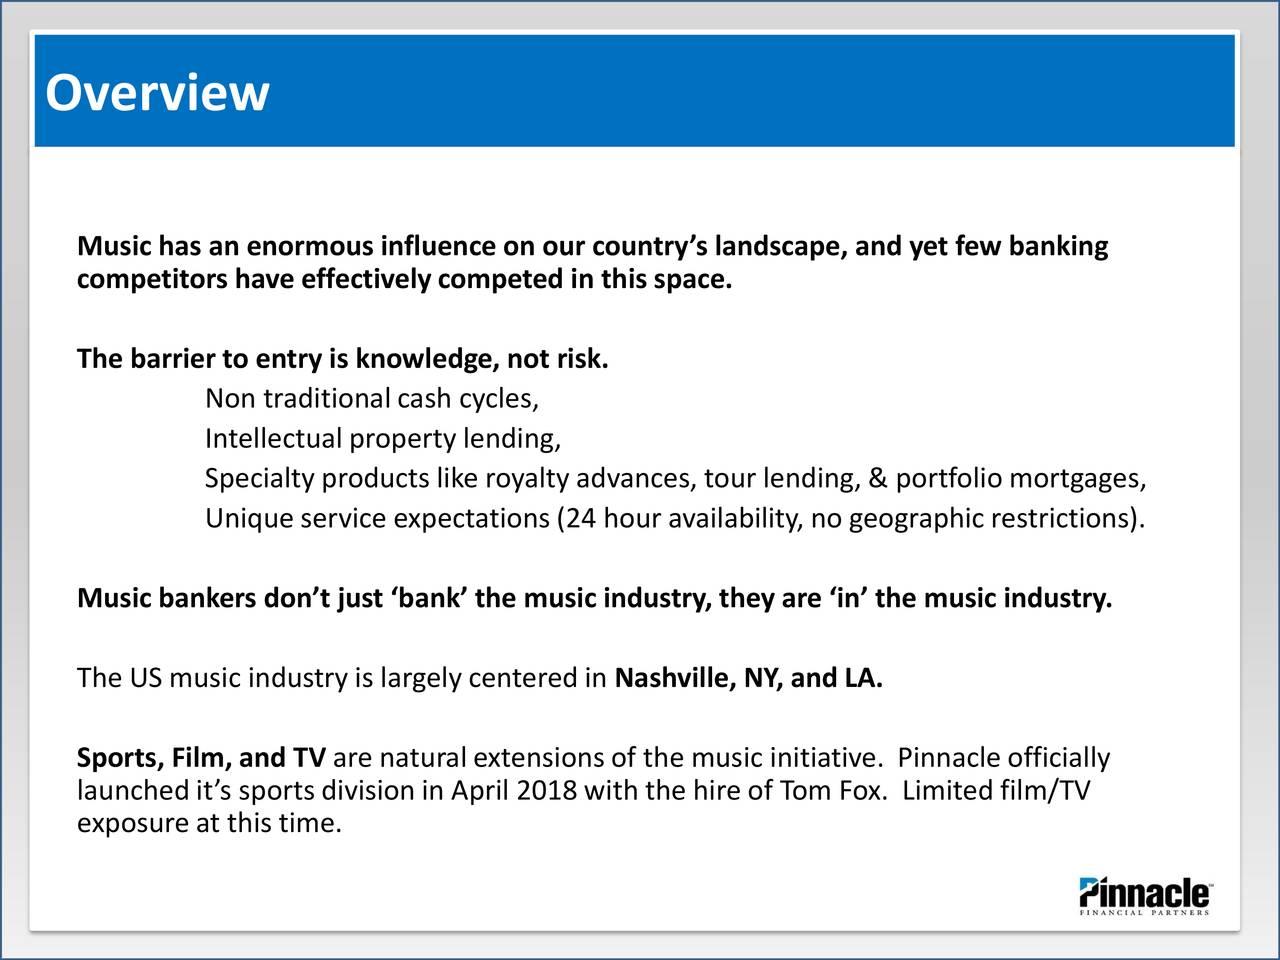 Pinnacle Financial Partners (PNFP) Investor Presentation